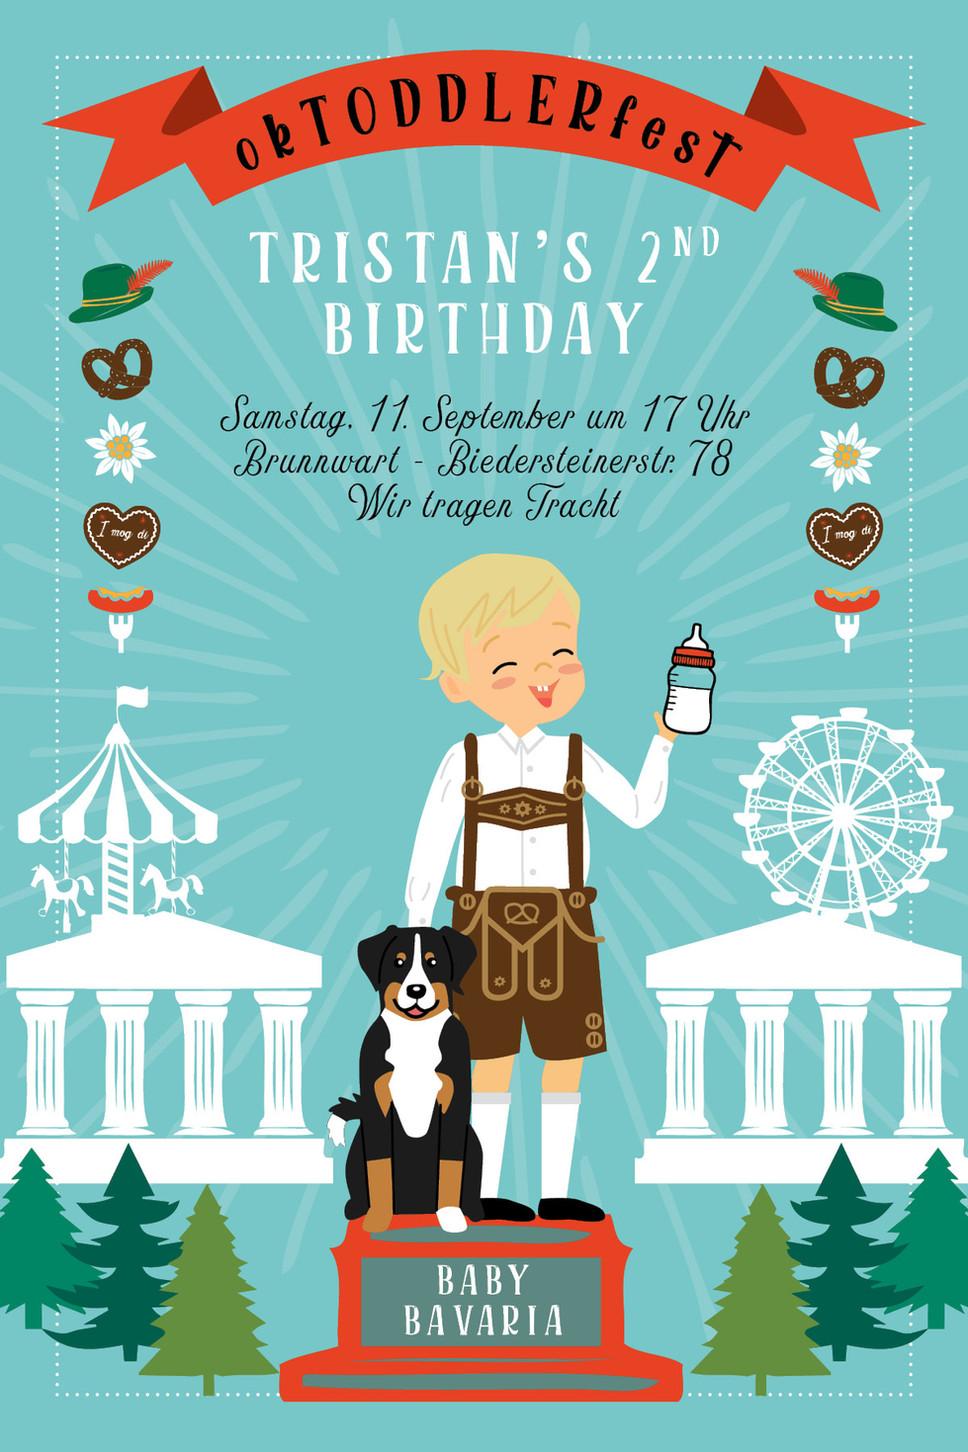 BIRTHDAY INVITATIONS: TRISTAN'S SECOND BIRTHDAY